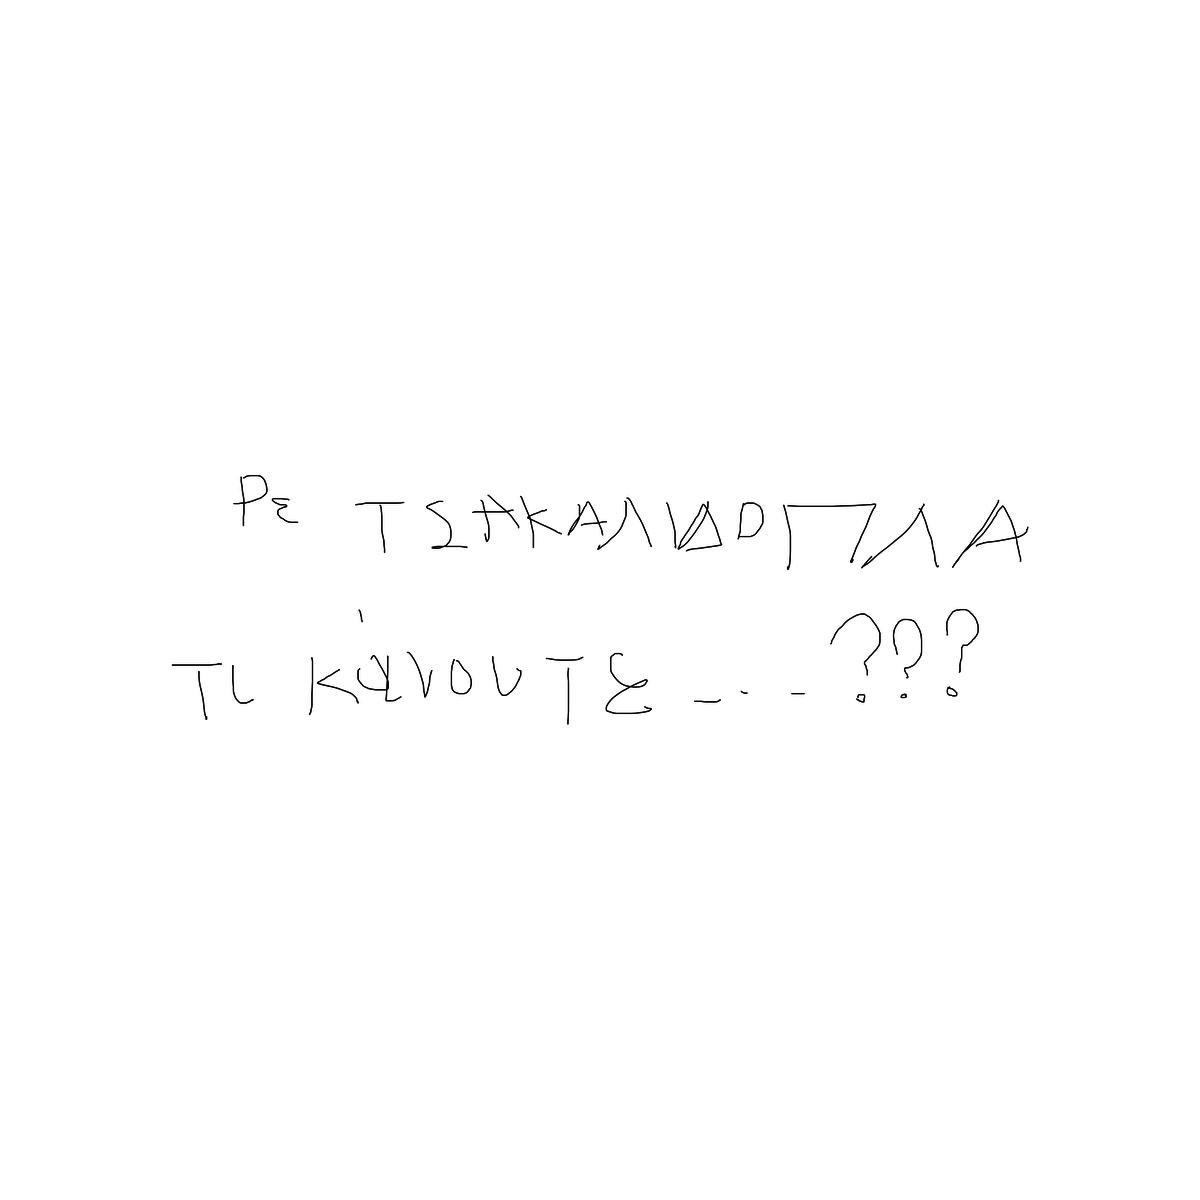 BAAAM drawing#5872 lat:37.6730422973632800lng: 21.4394893646240230